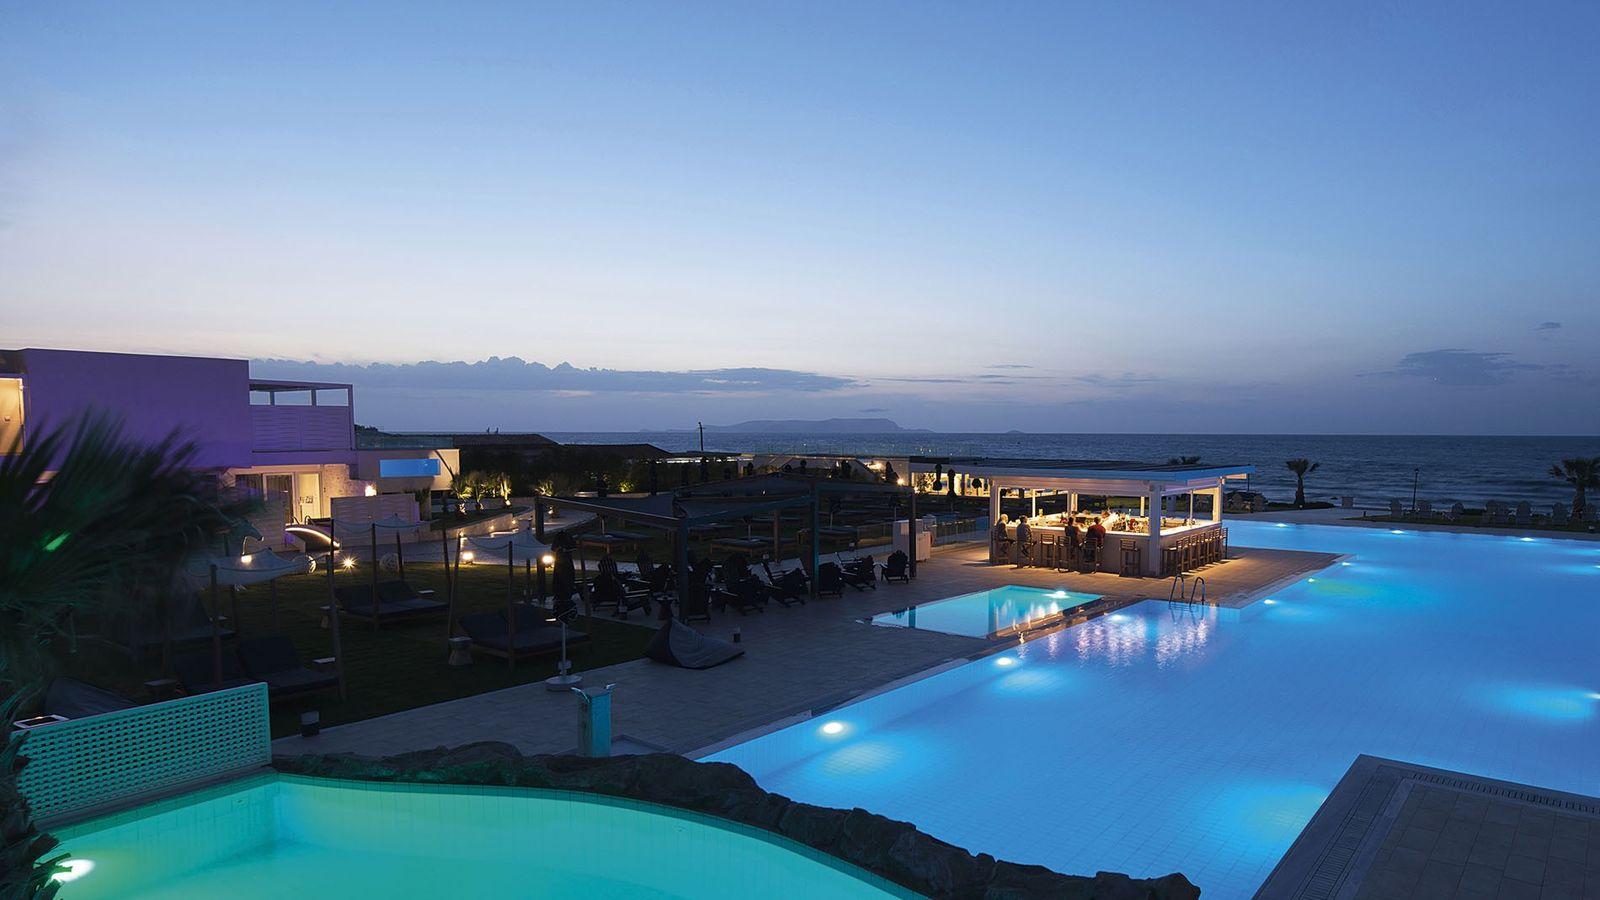 Outside pool overlooking the sea at TUI Sensimar Insula Alba Resort and Spa